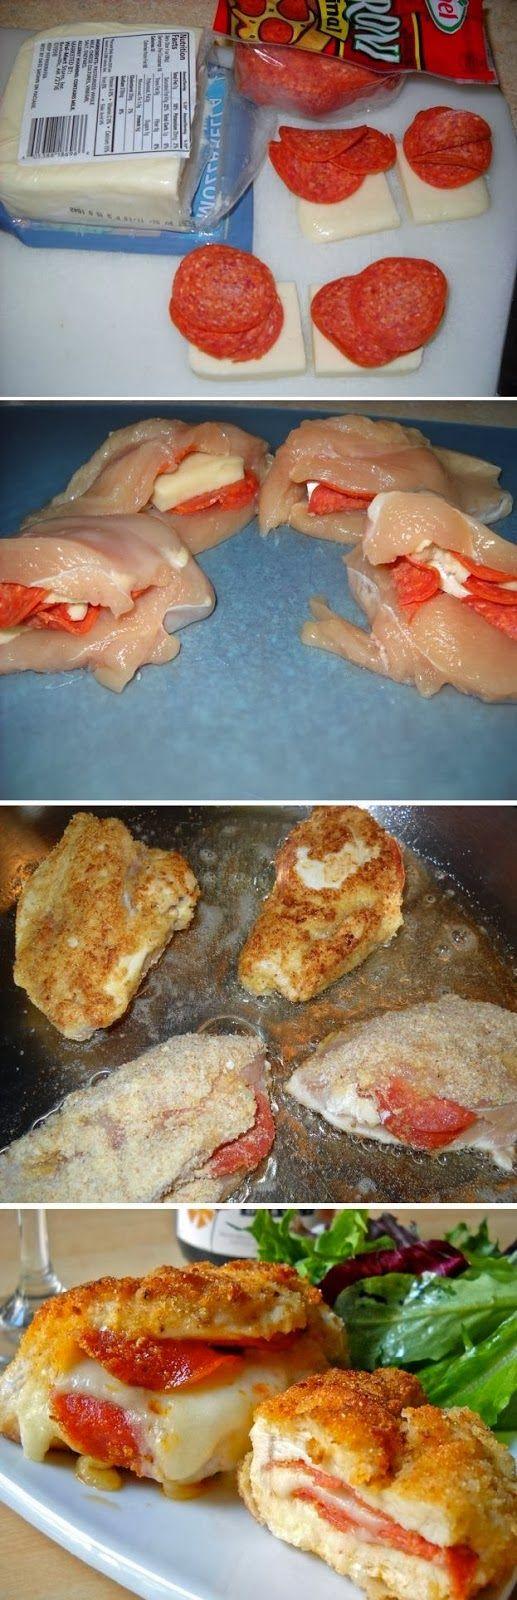 Yummy Recipes: Pepperoni stuffed chicken recipe